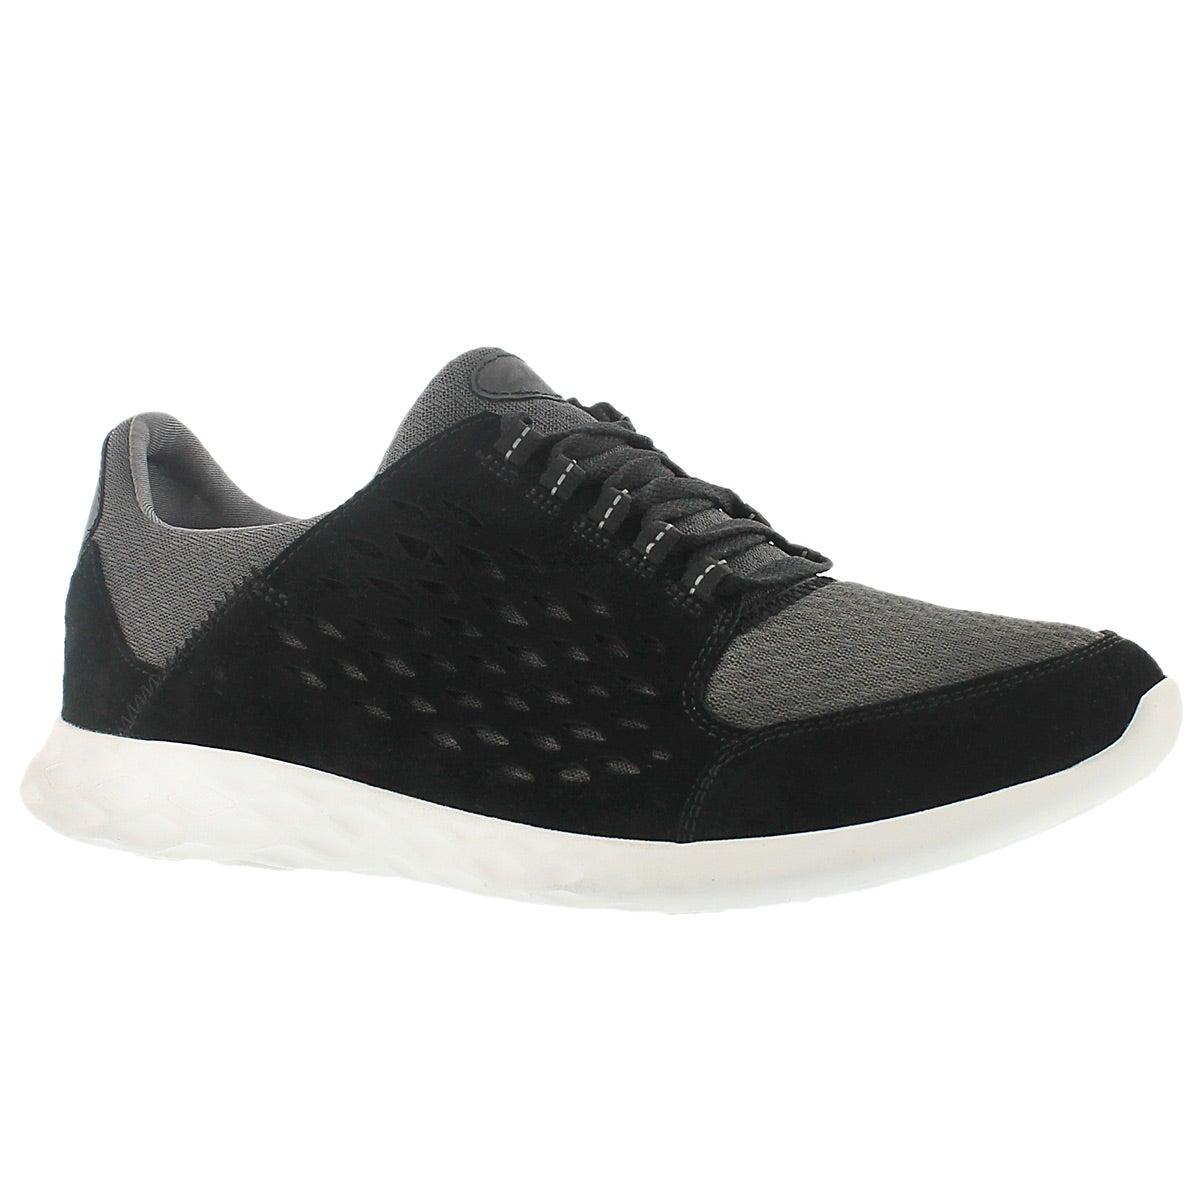 Mns Seremax Lace black lace up sneaker